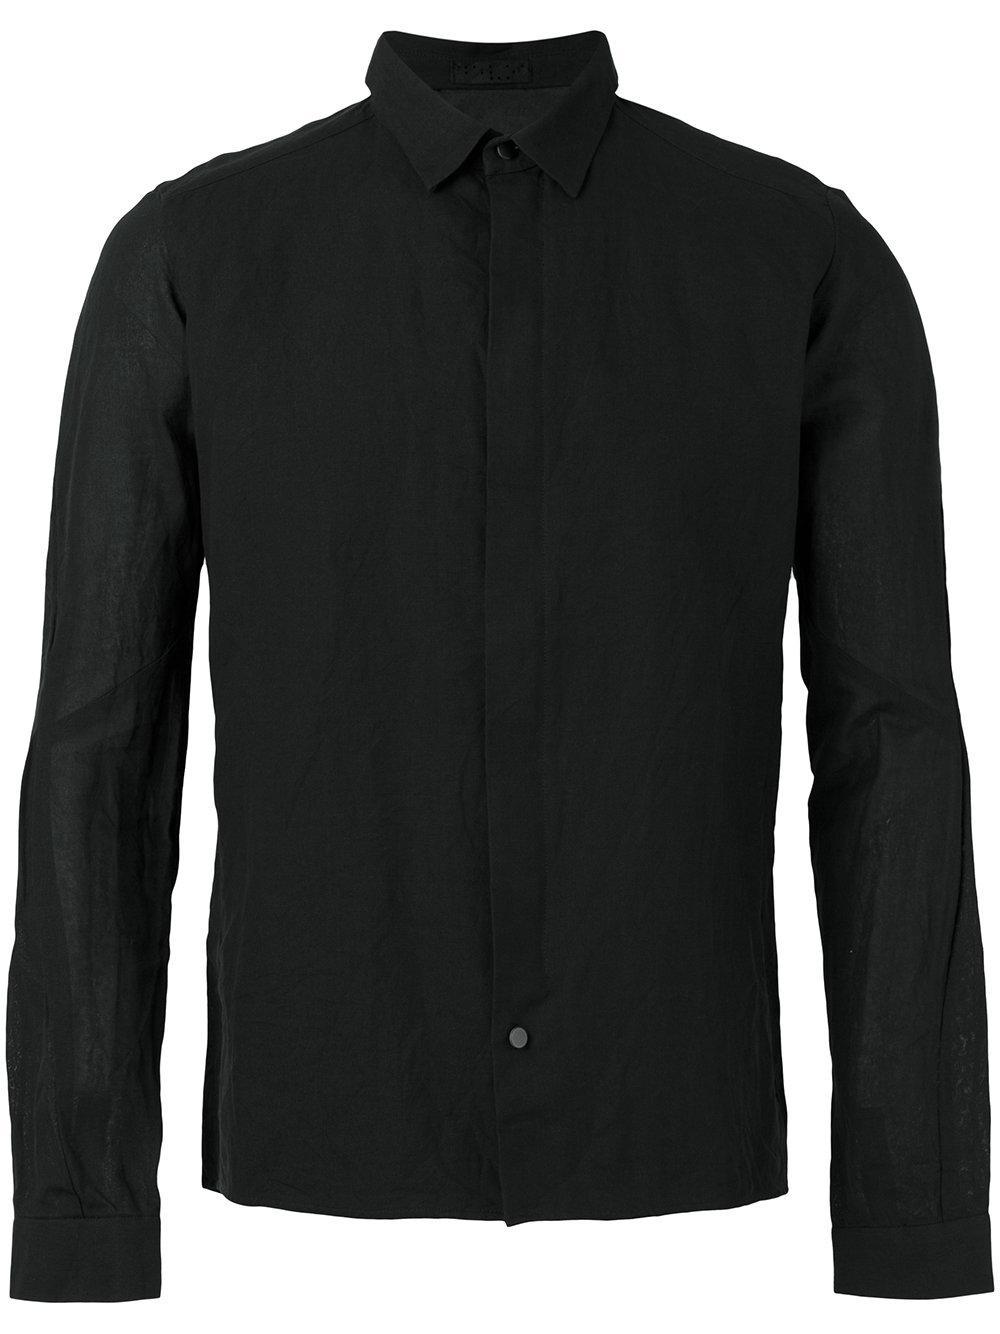 Devoa Slim Fit Shirt In Black For Men Lyst